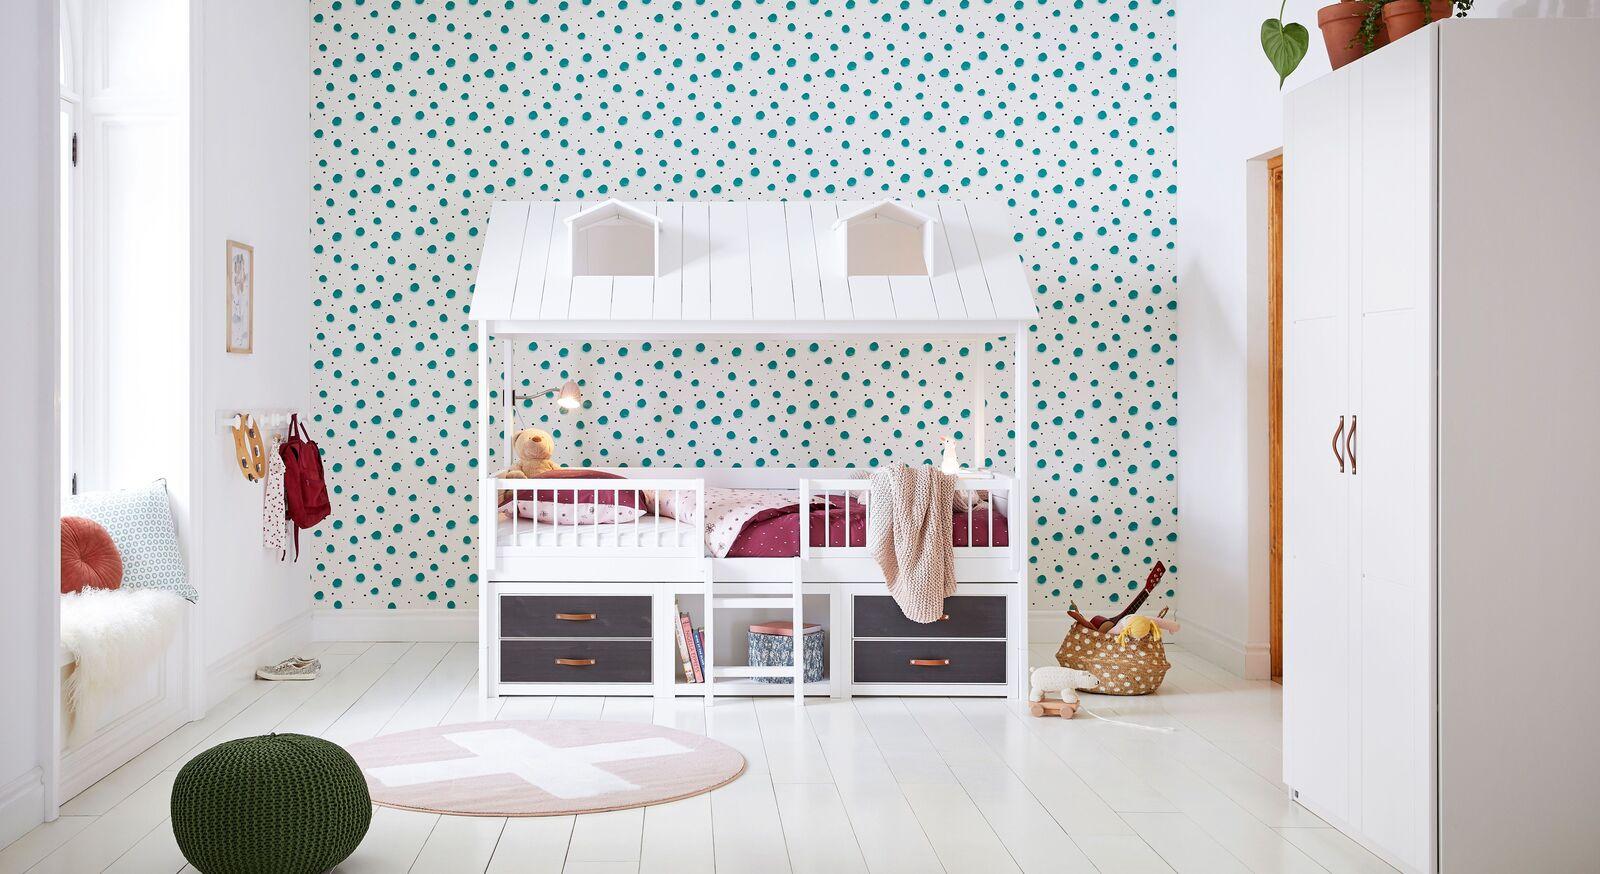 LIFETIME Kojenbett Beachhouse mit passenden Kinderzimmer-Accessoires